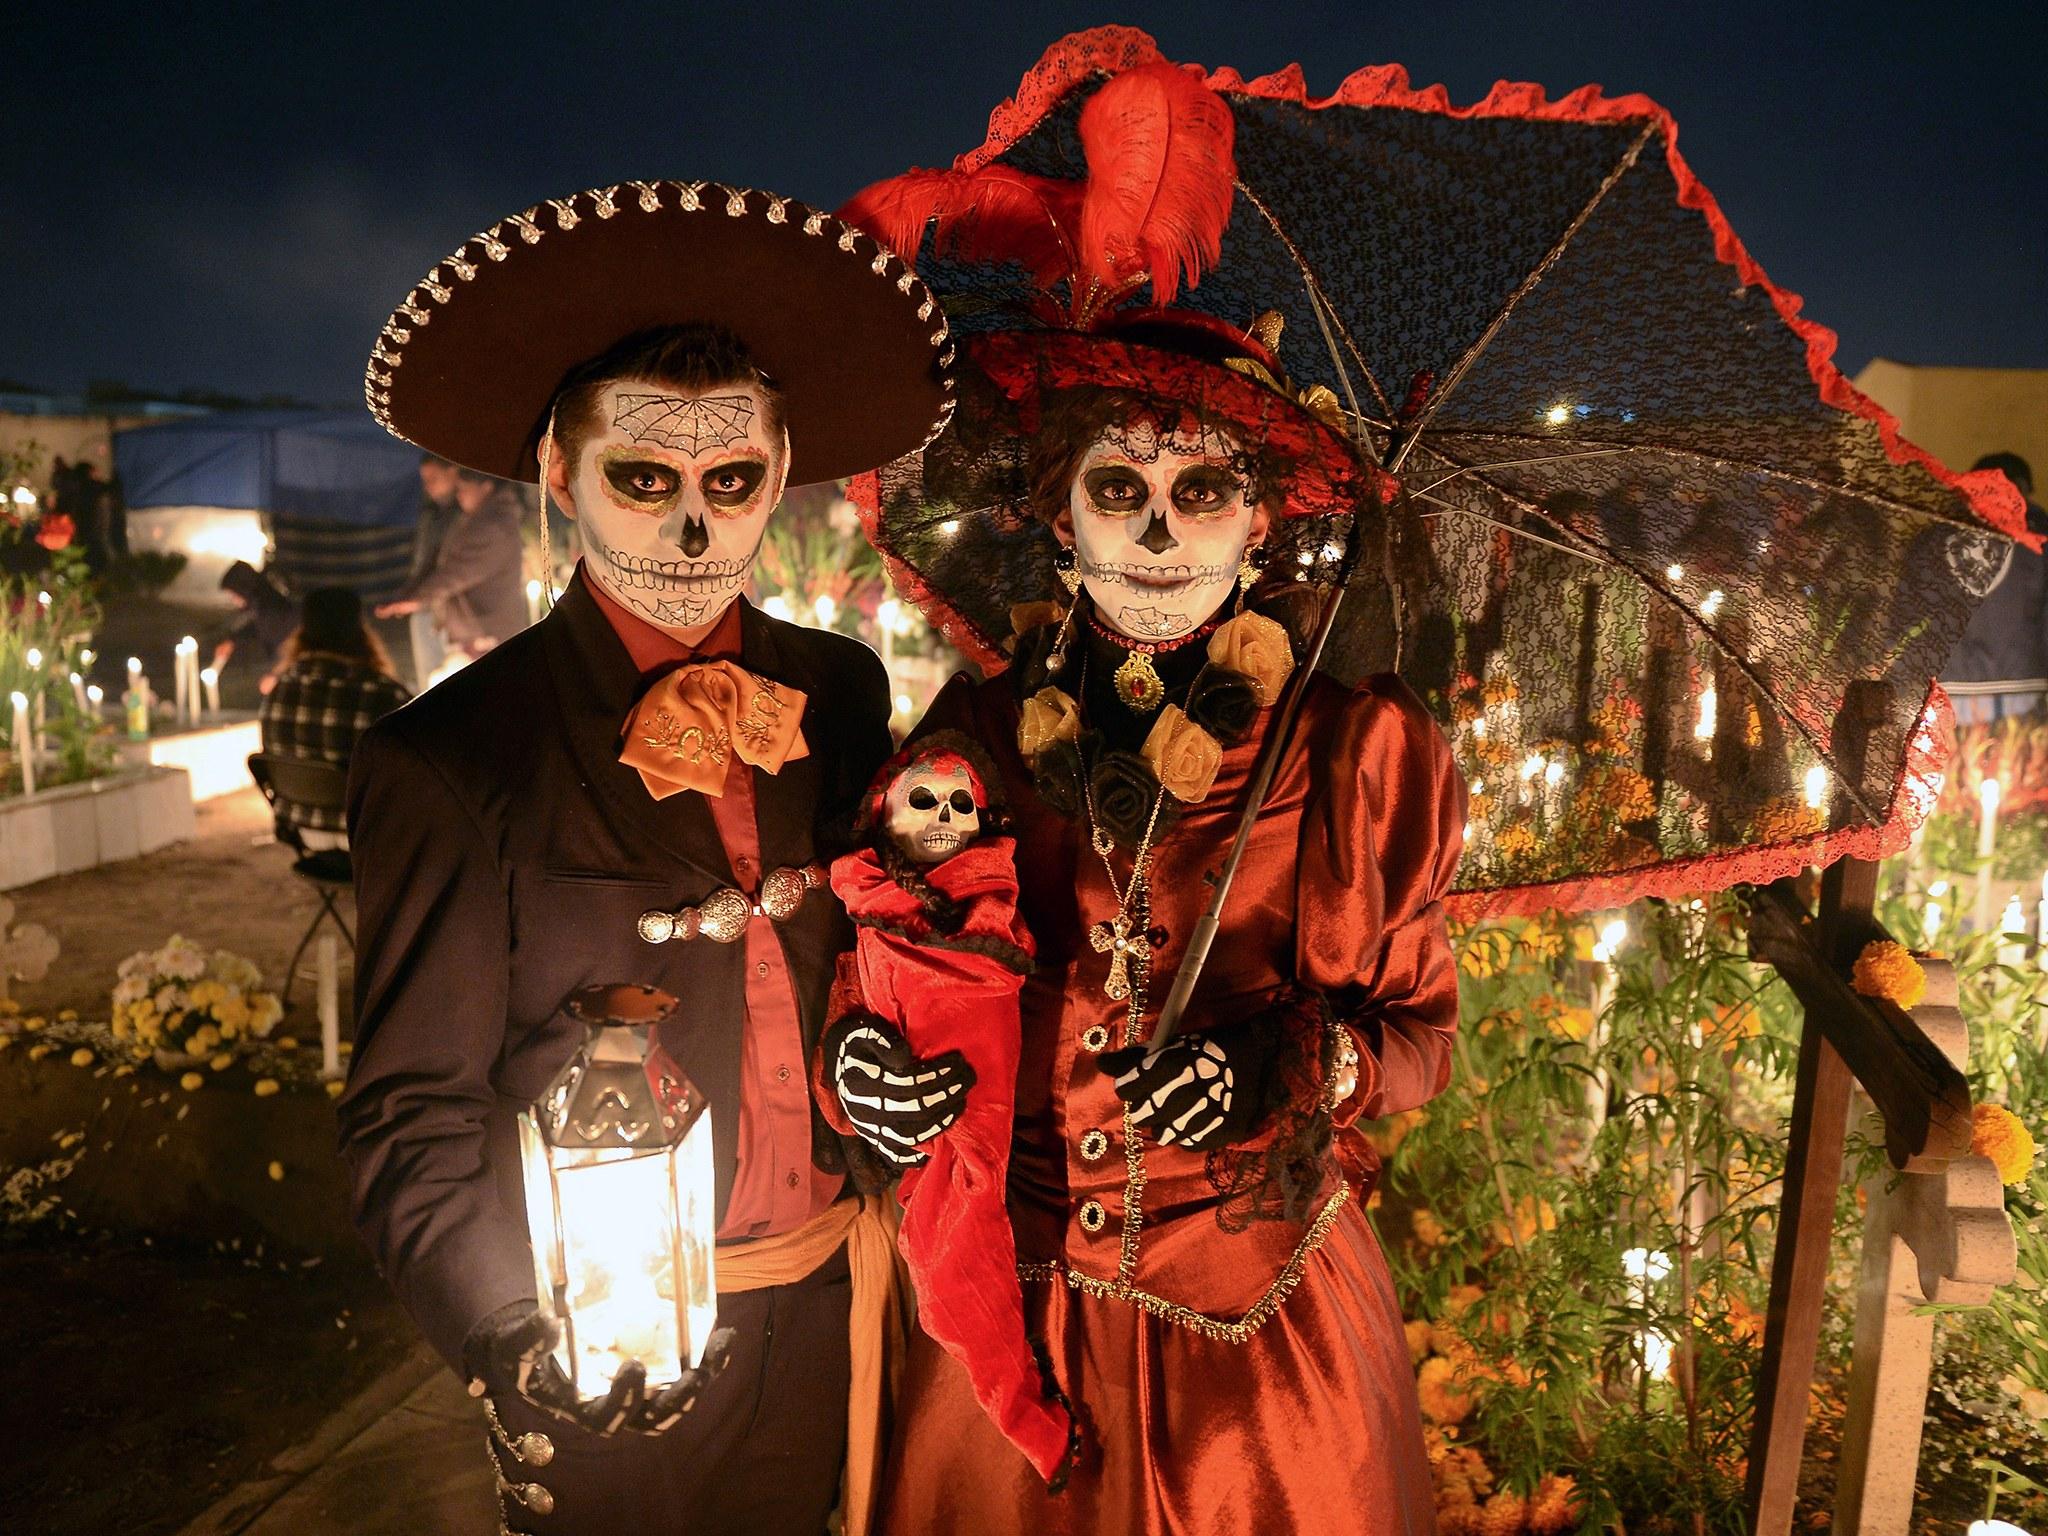 Halloween a famous festival